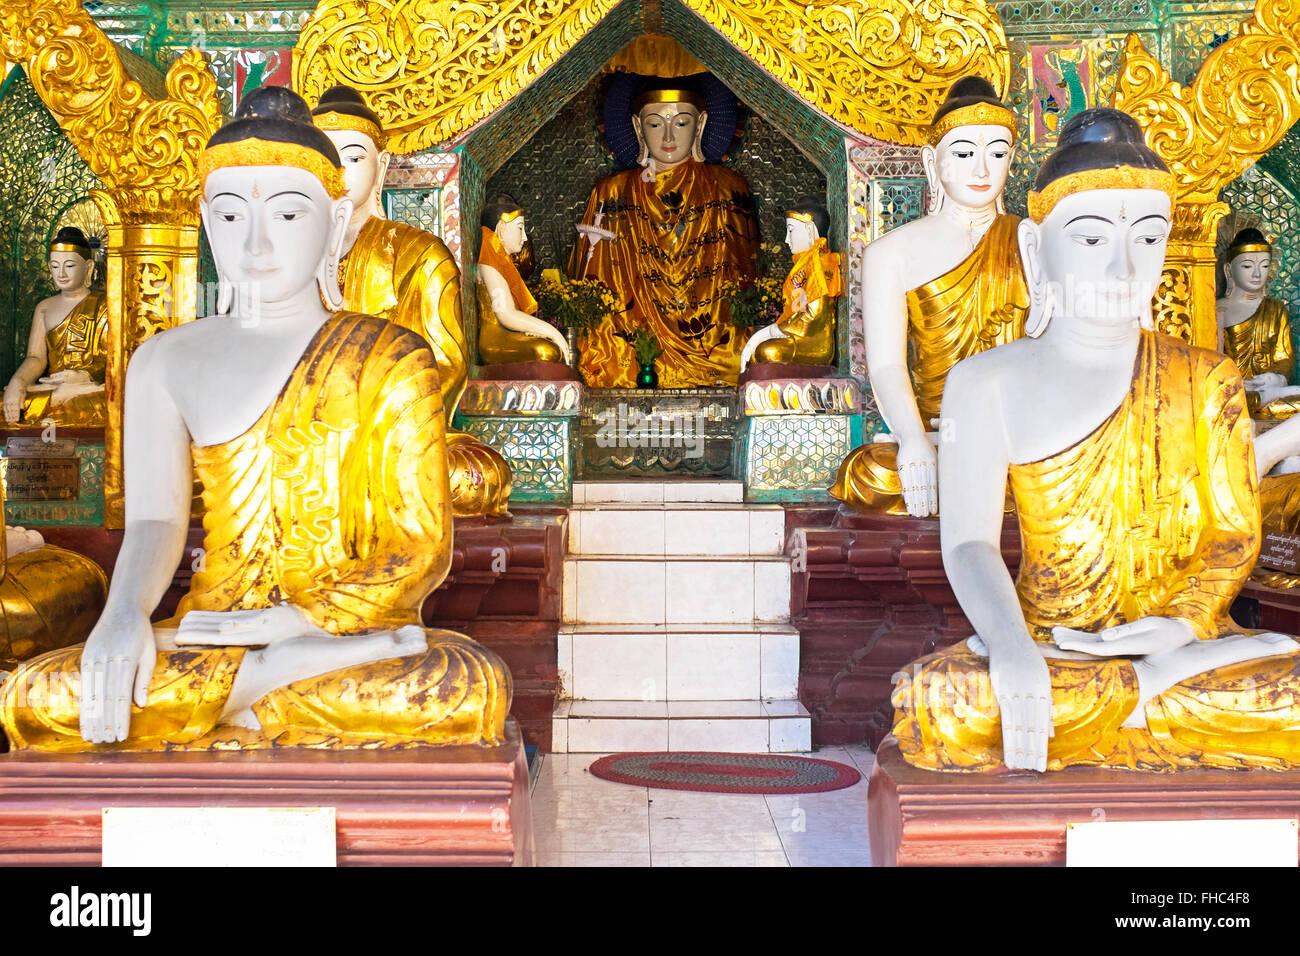 Buddha statues in the Shwedagon pagode in Yangon Myanmar Stock Photo